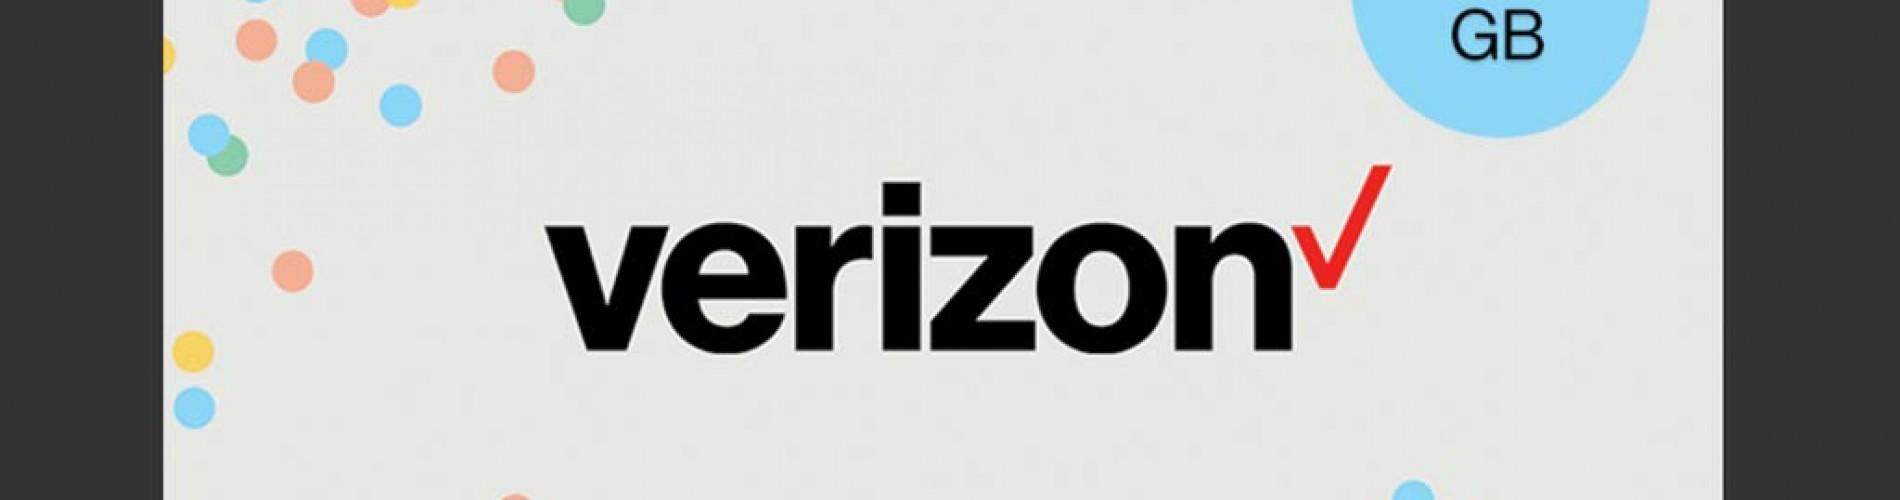 Verizon customers can gift data data this holiday season